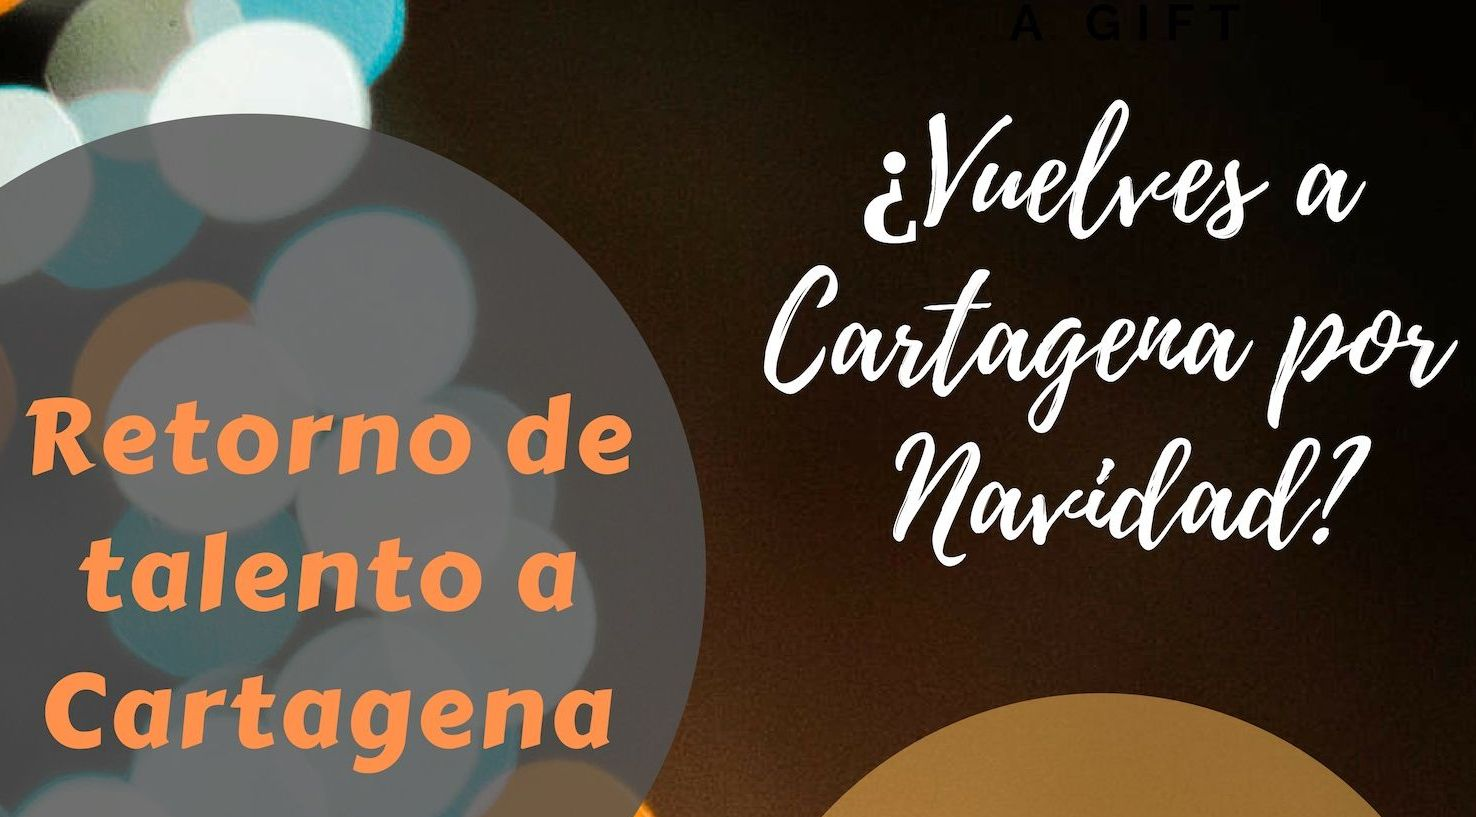 'Programa Retorno de Talento a Cartagena'